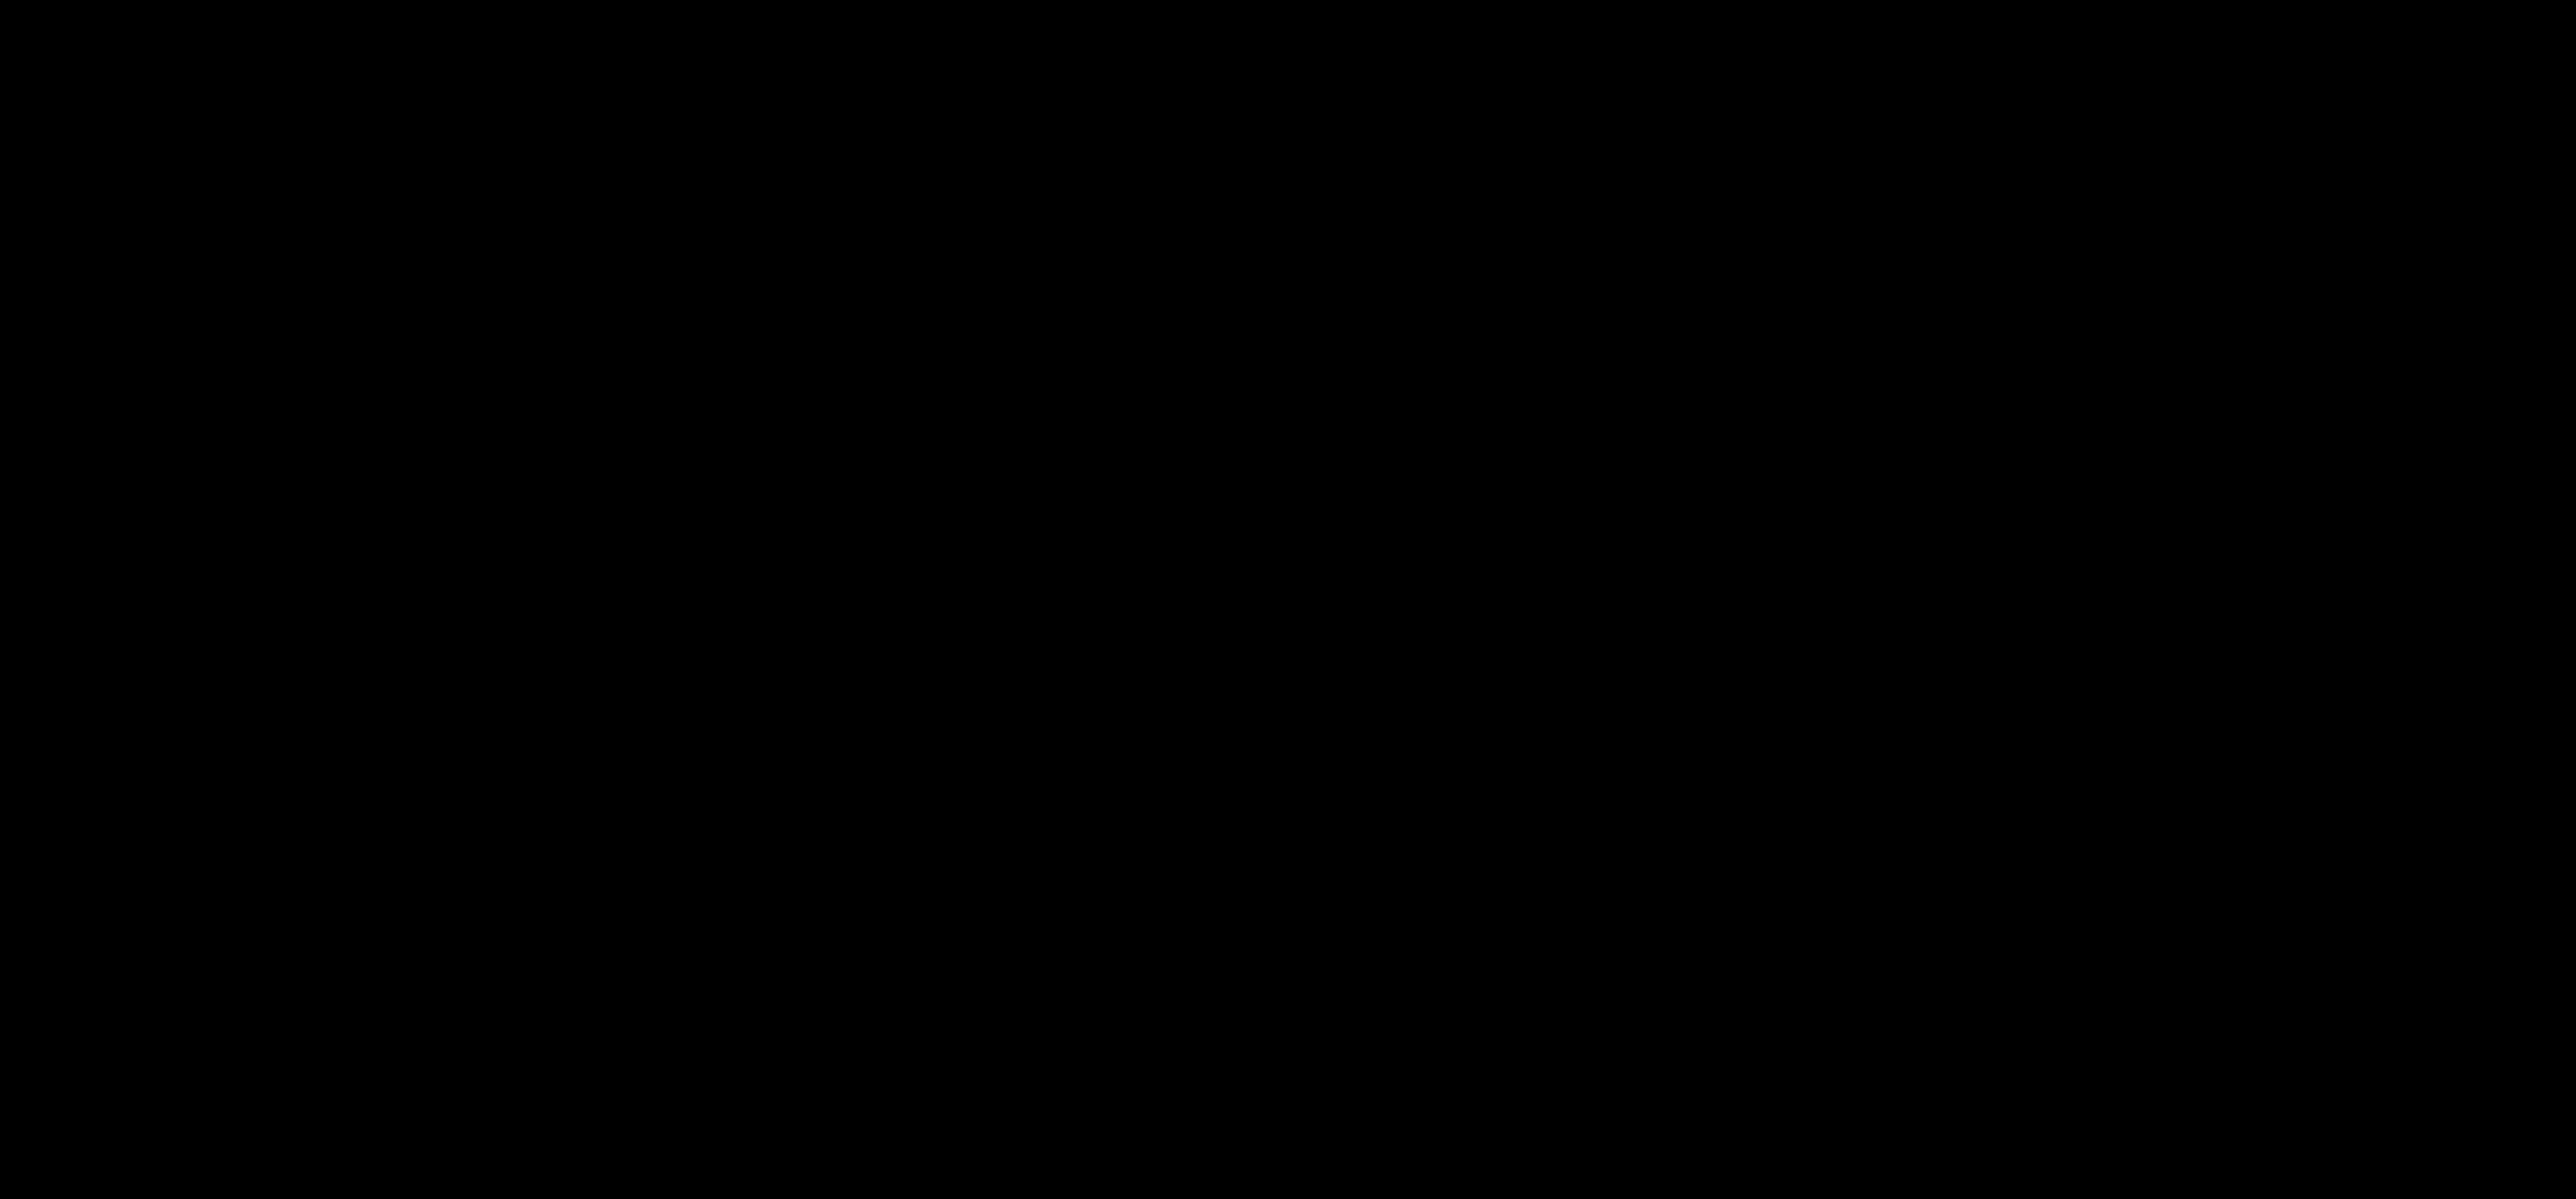 Huishoudbeurs logo png